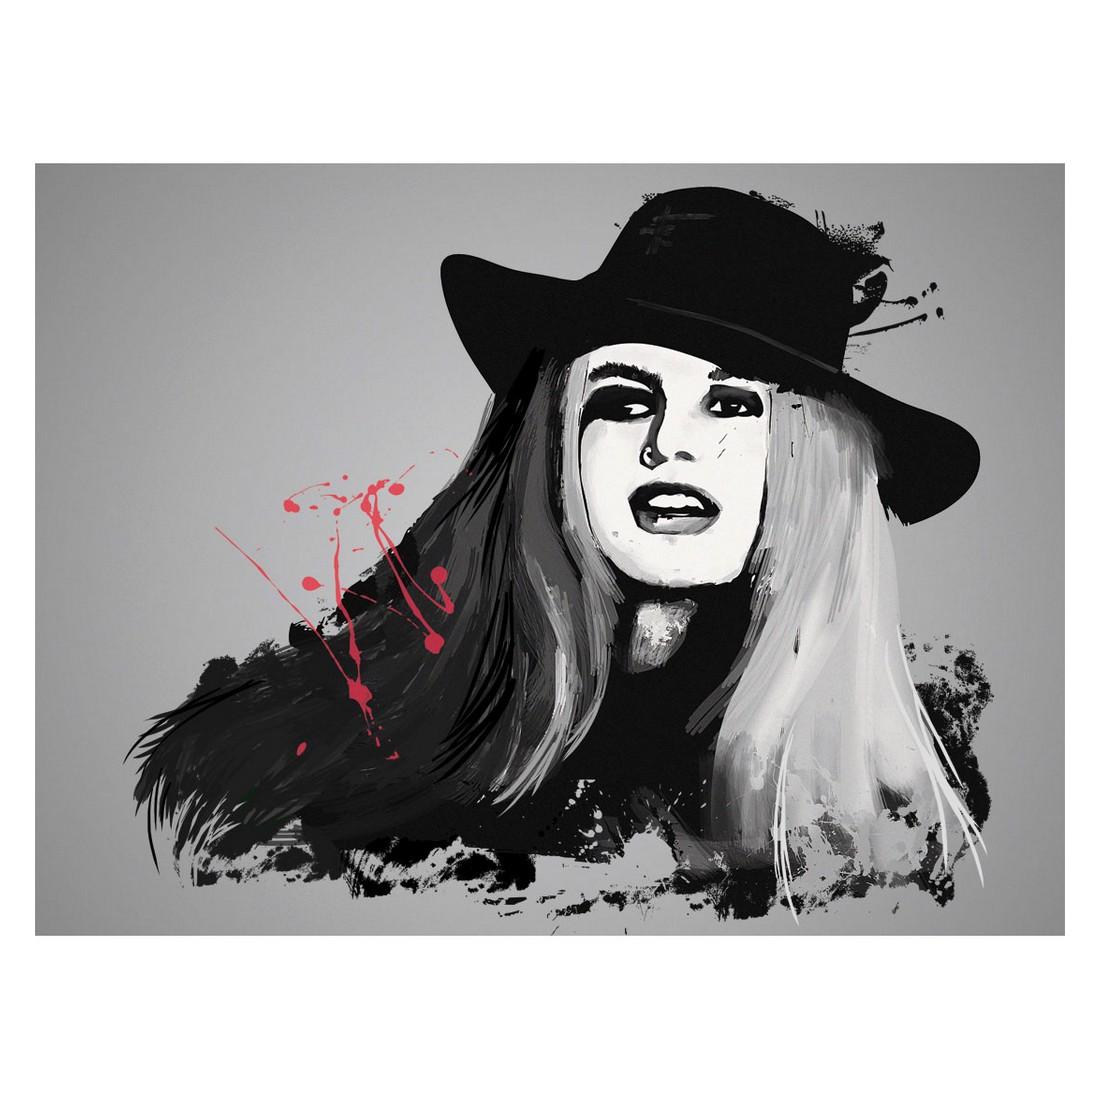 Ölgemälde Brigitte Bardot – Größe 70 x 100 cm, yourPainting kaufen